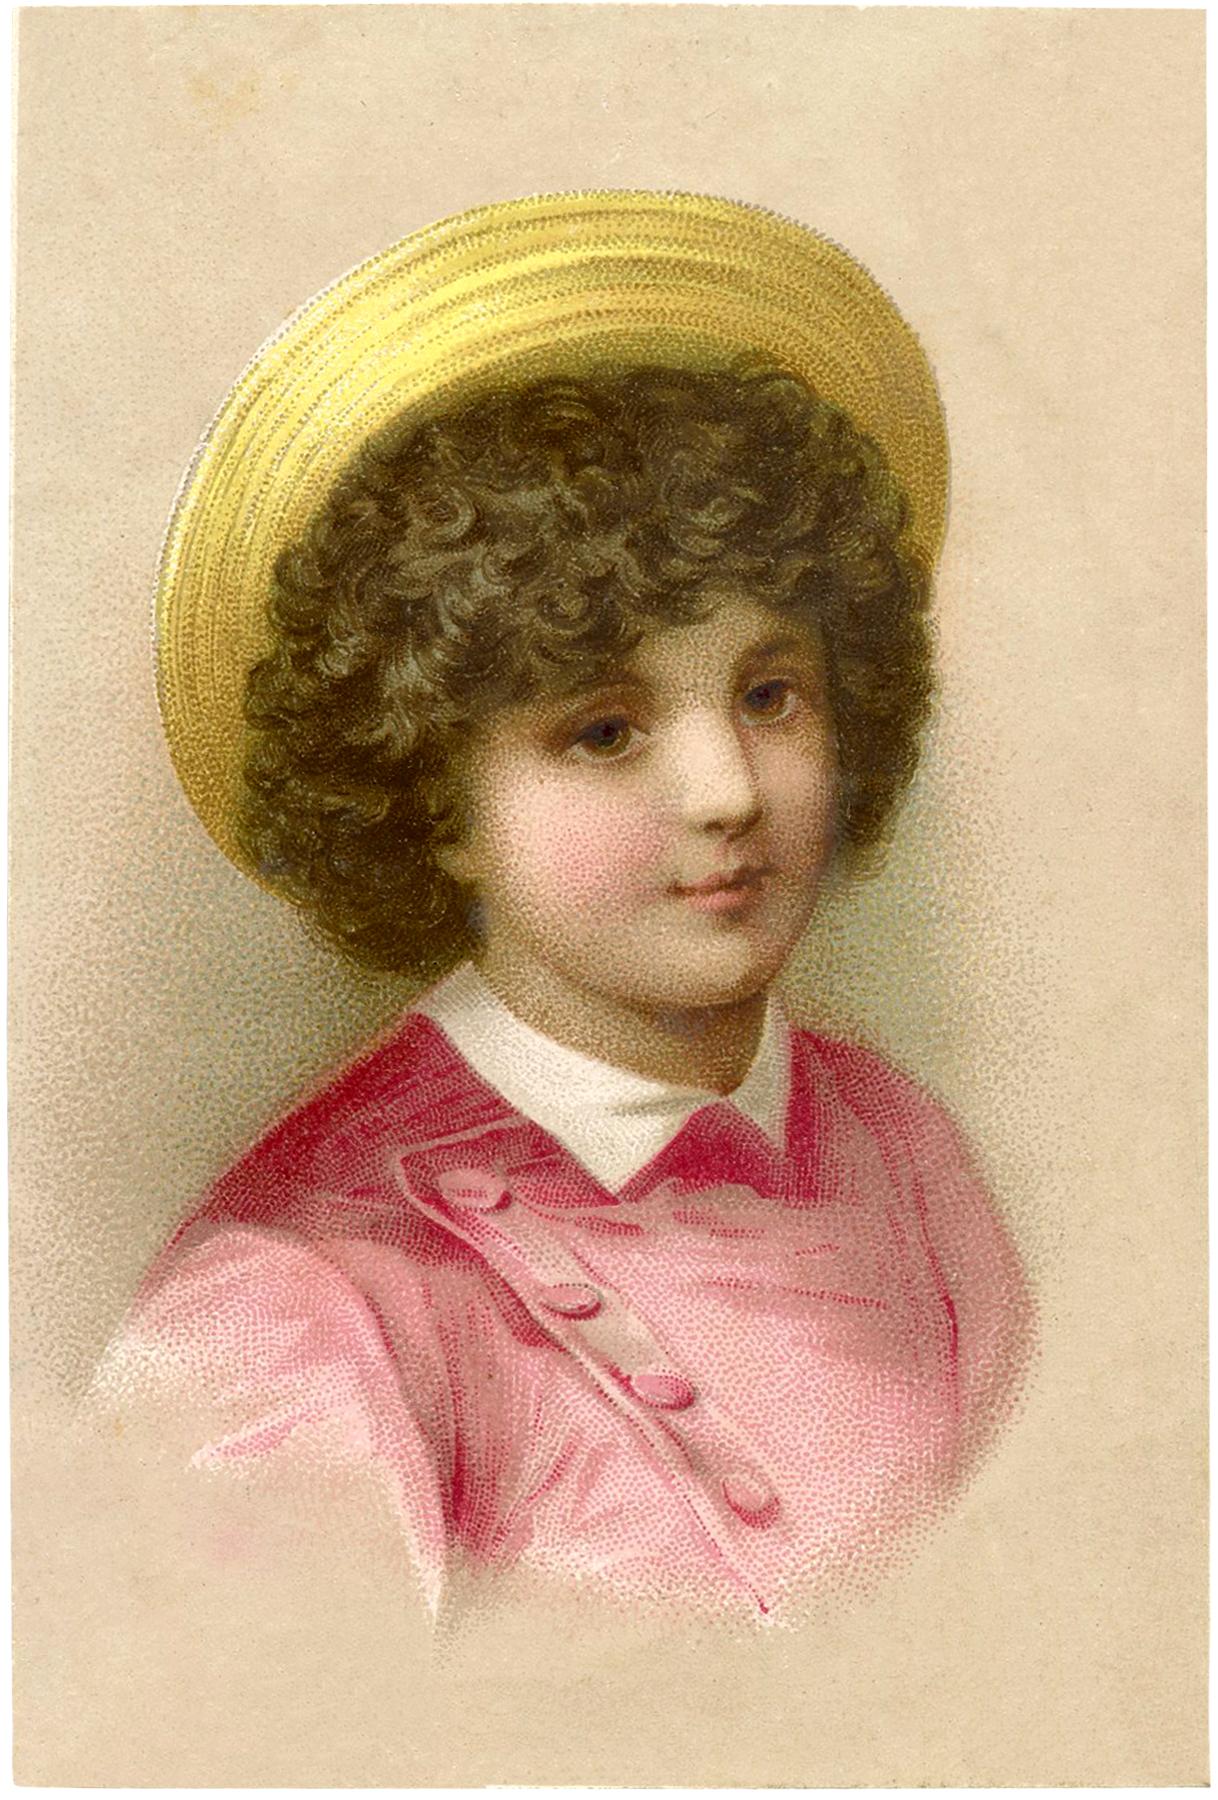 Pretty Child with Straw Hat